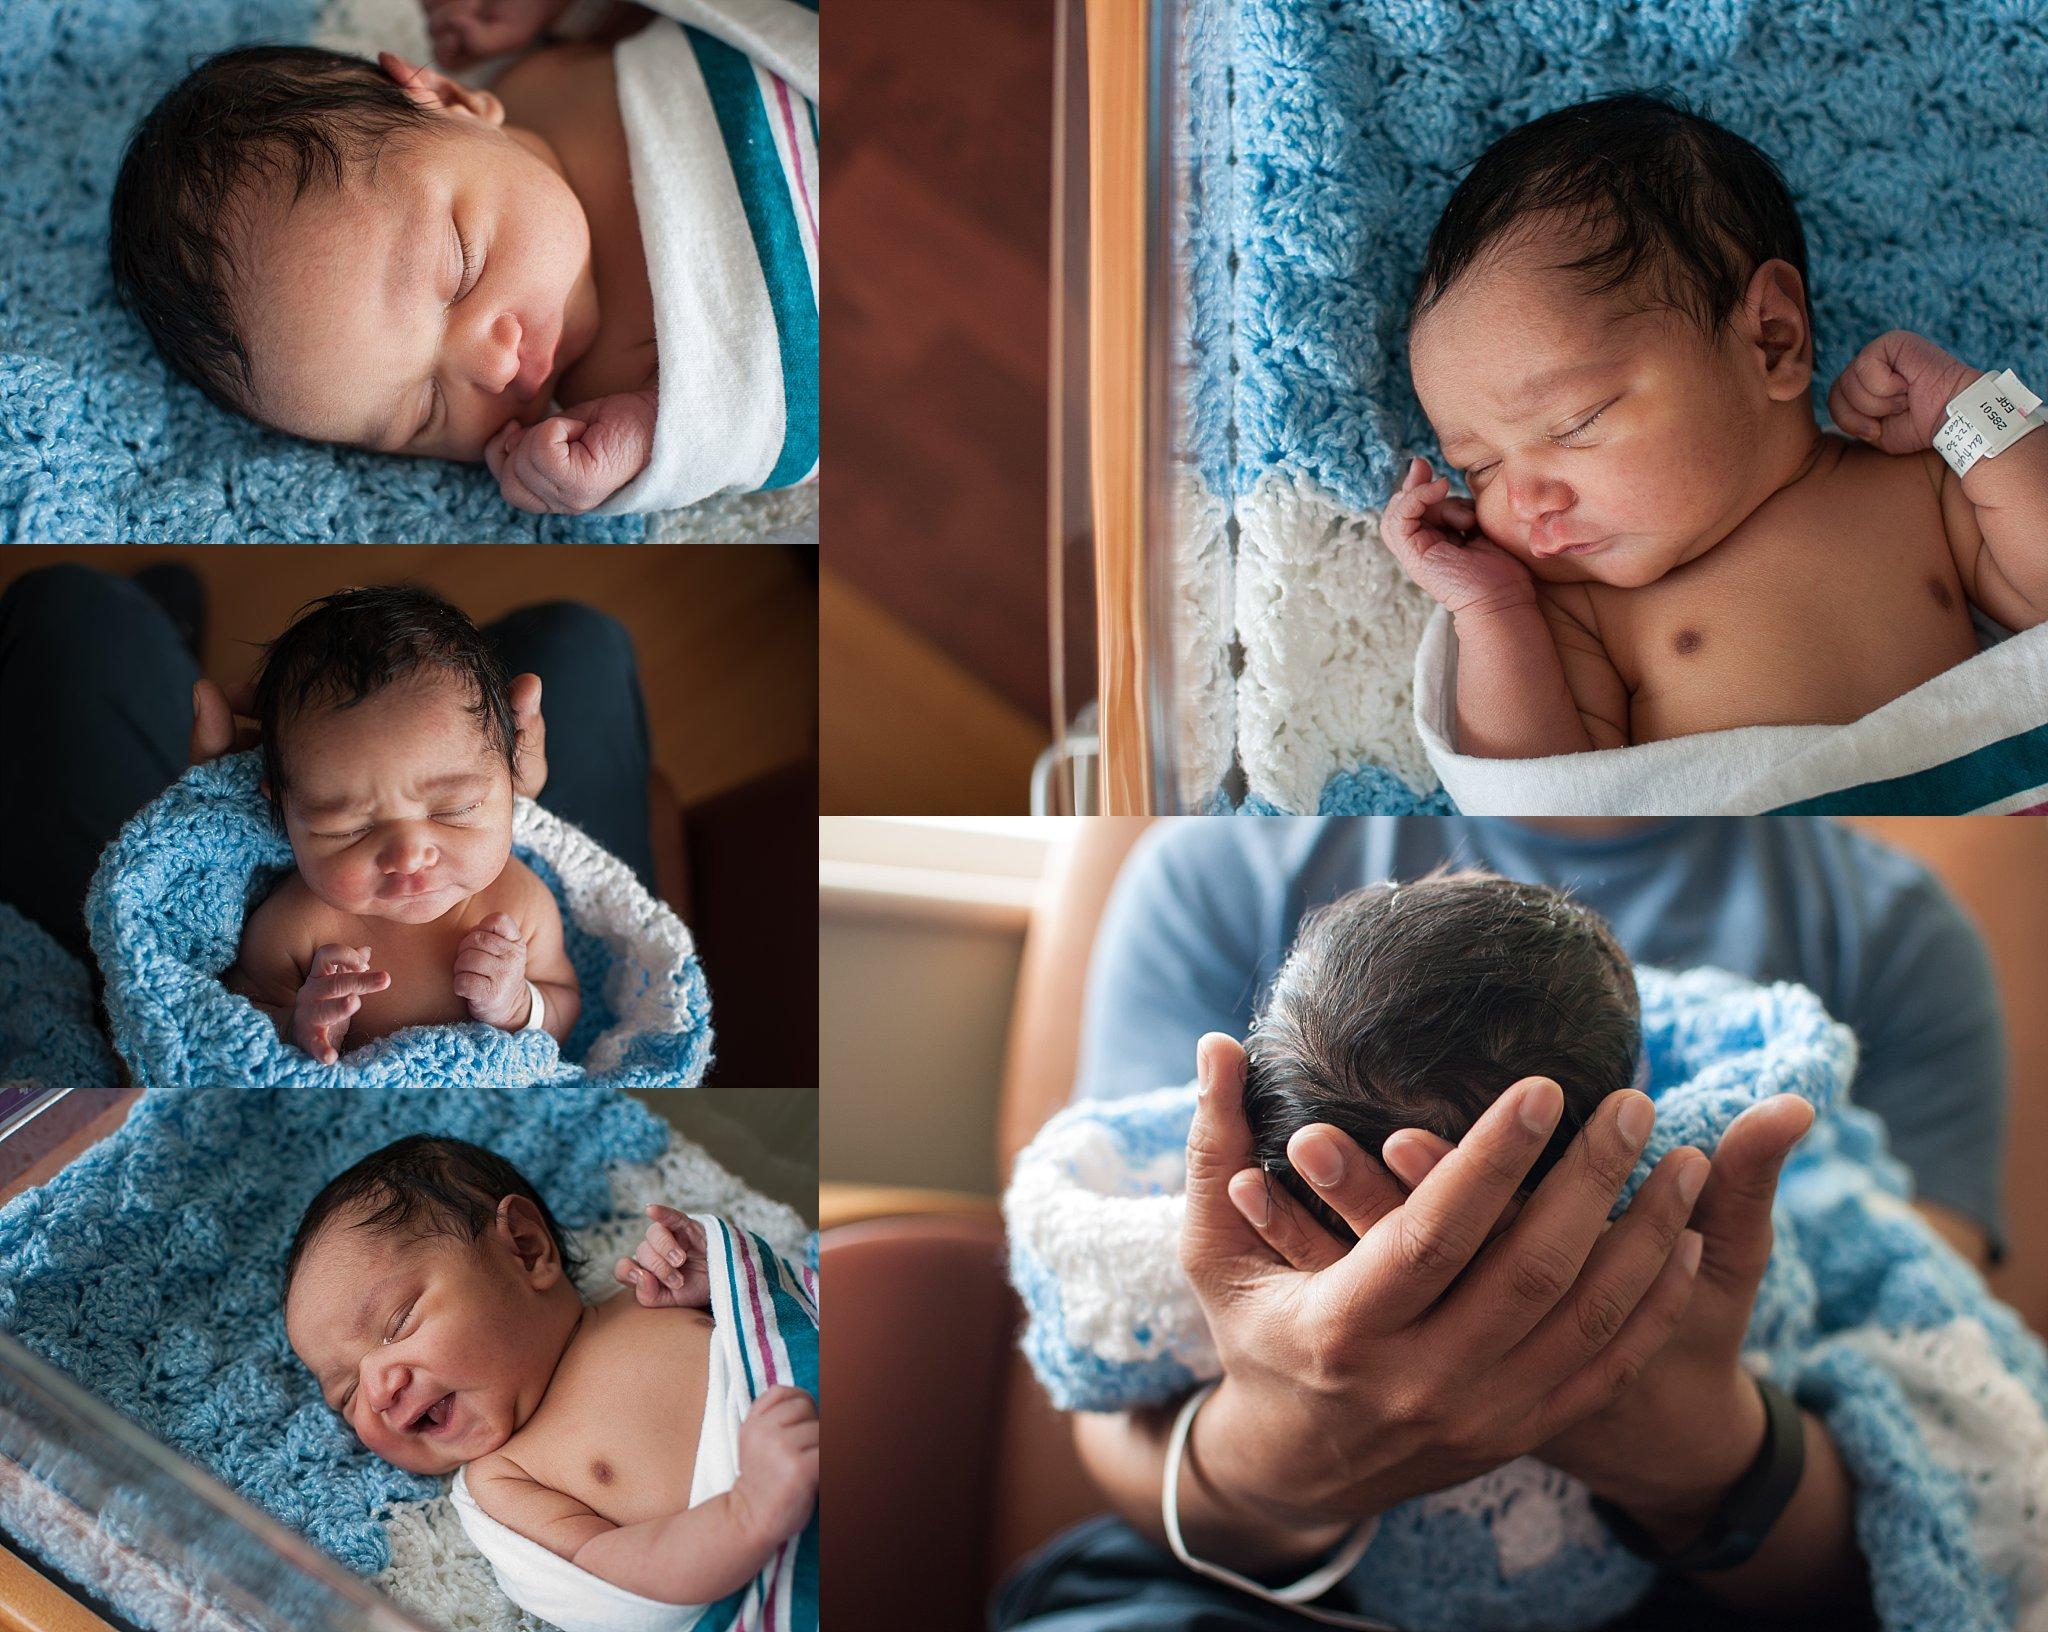 Newborn baby boy is cradled in baby bassinett at Advocate Bromenn in Bloomington, IL.